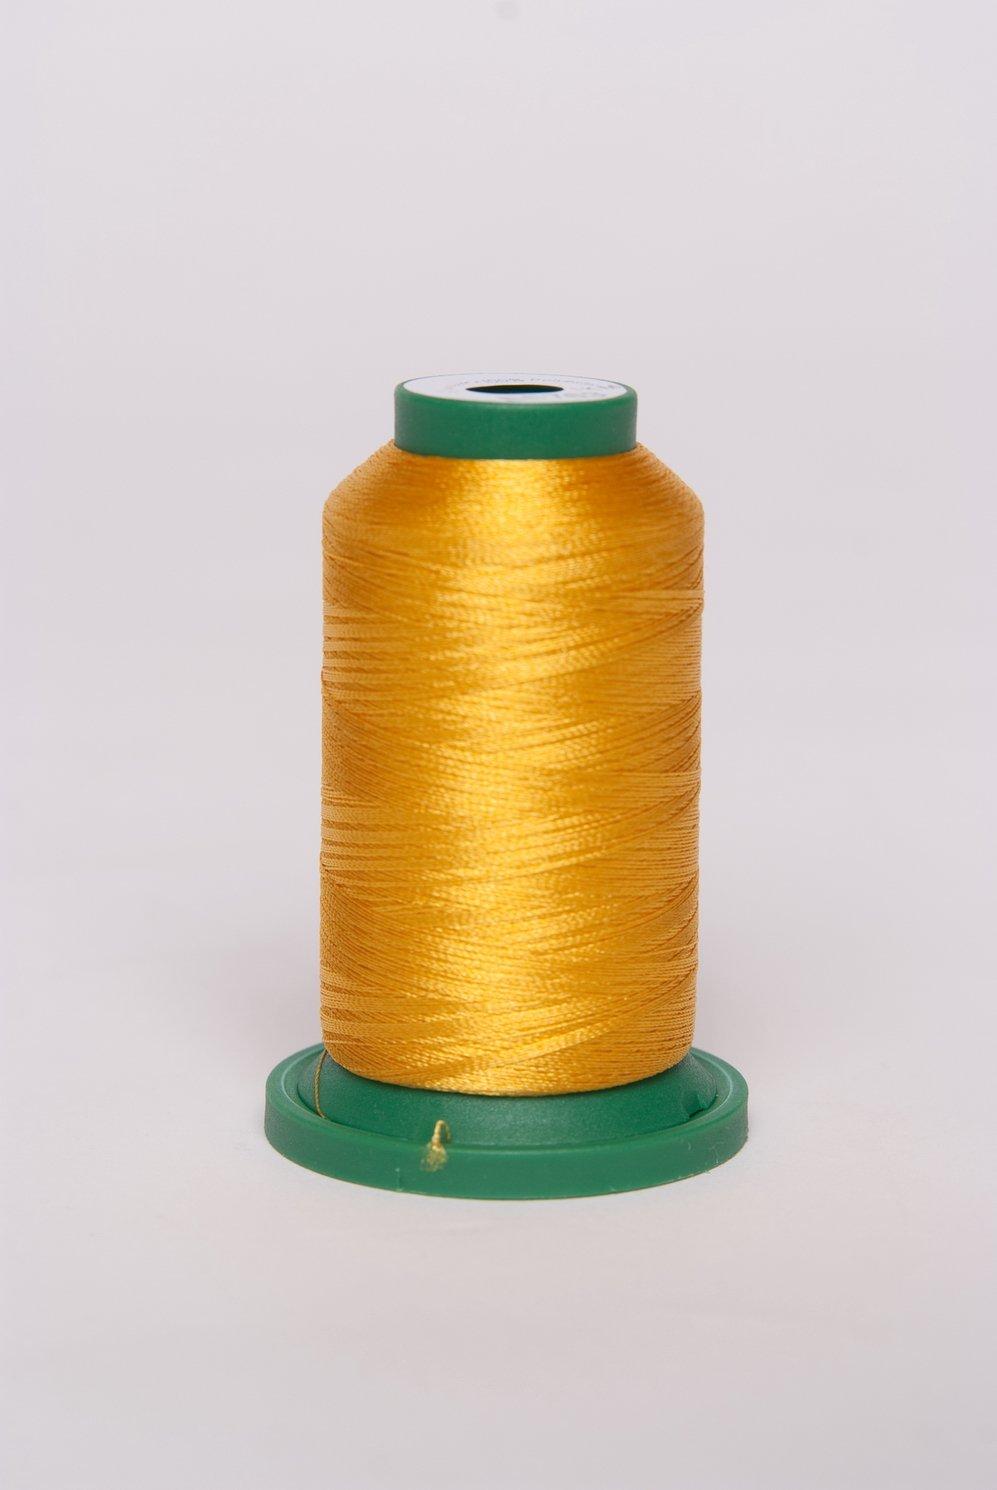 Crocus 5 - ES763 - Exquisite Embroidery Thread - 1000 meters